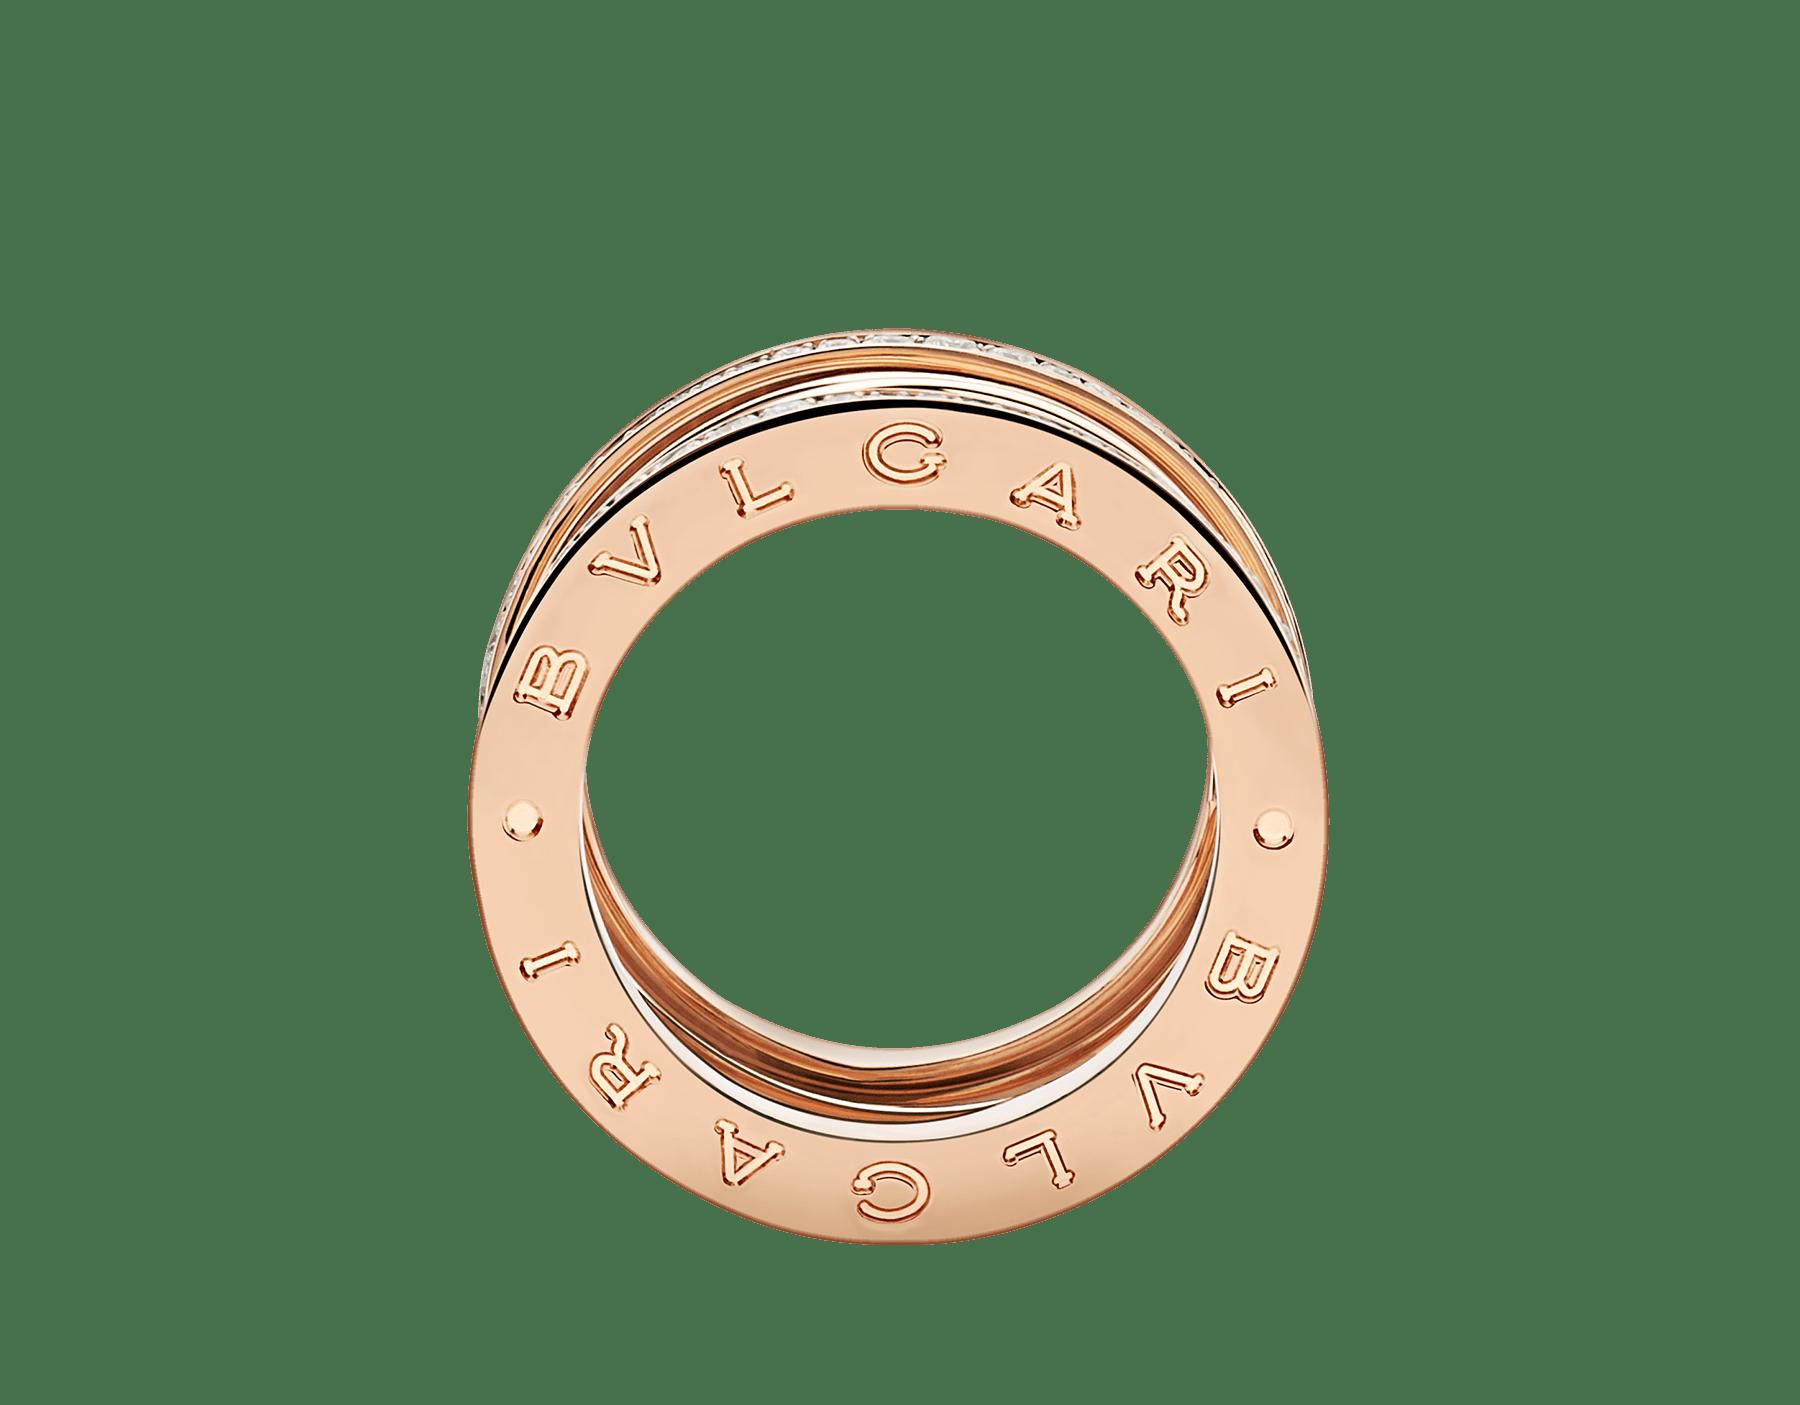 Anillo B.zero1 Design Legend de cuatro bandas en oro rosa de 18 qt con pavé de diamantes (0,61 ct) en los bordes. B-zero1-4-bands-AN858125 image 2